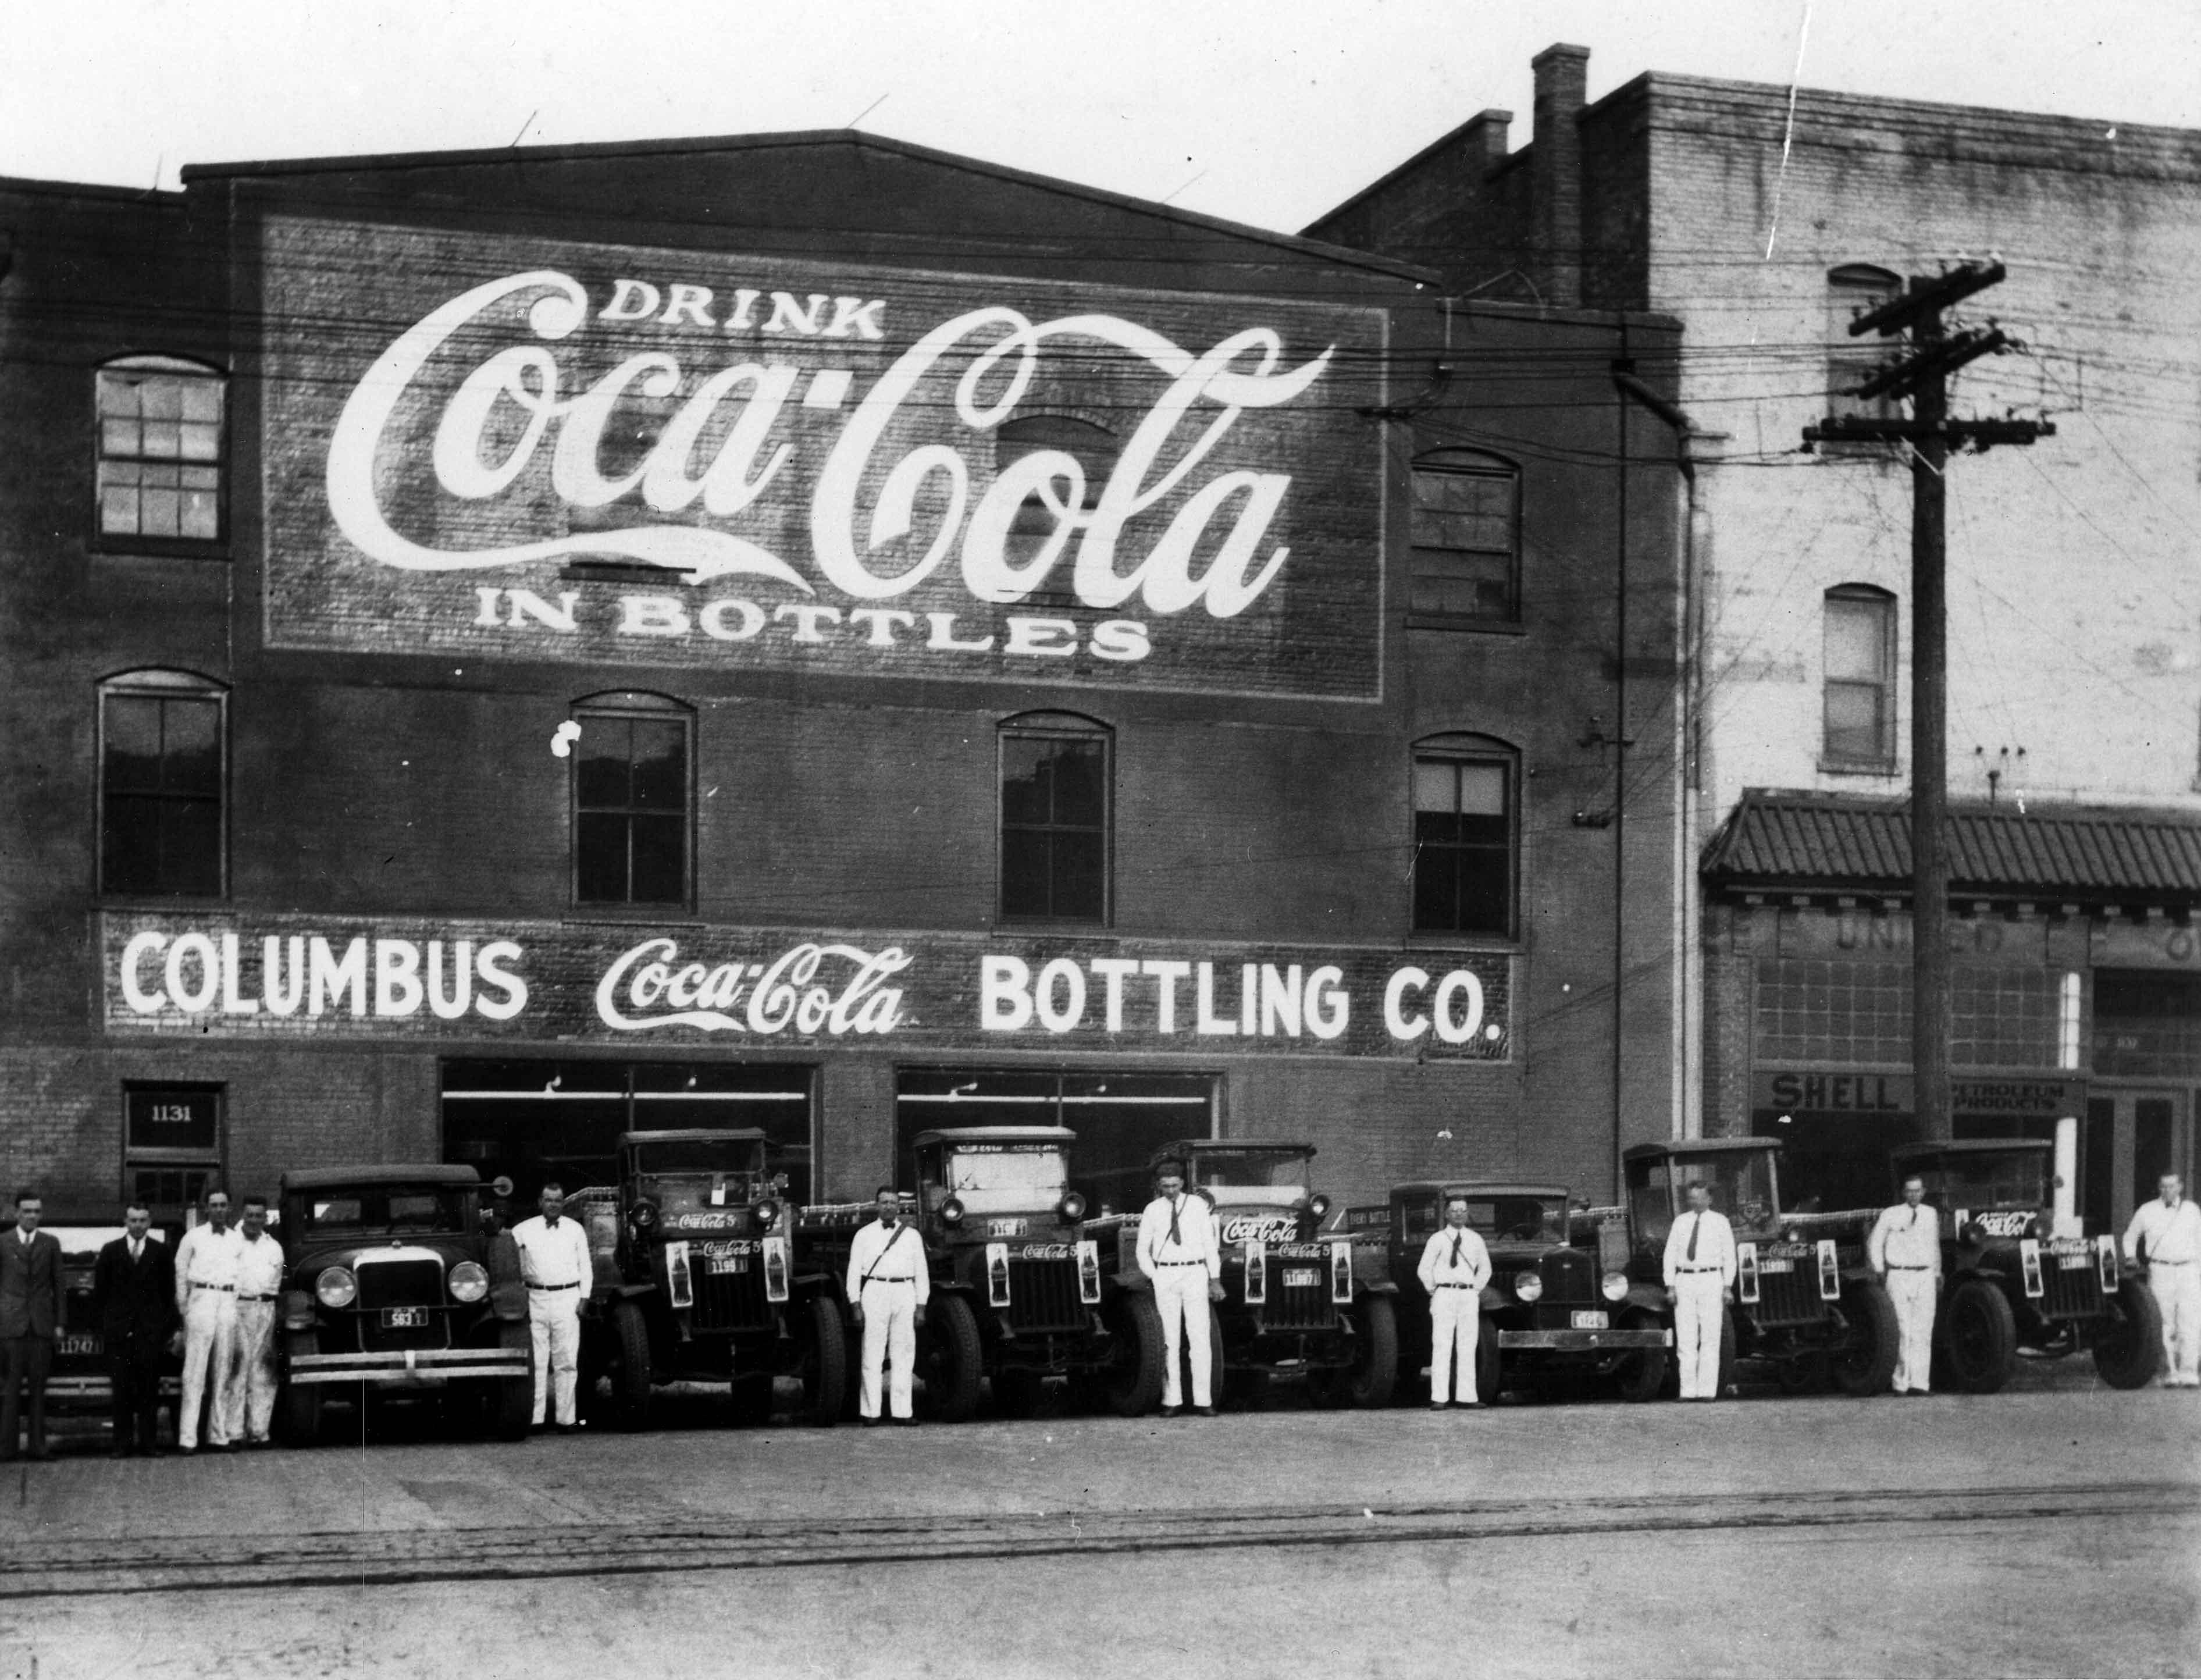 coca cola ne üretiyordu